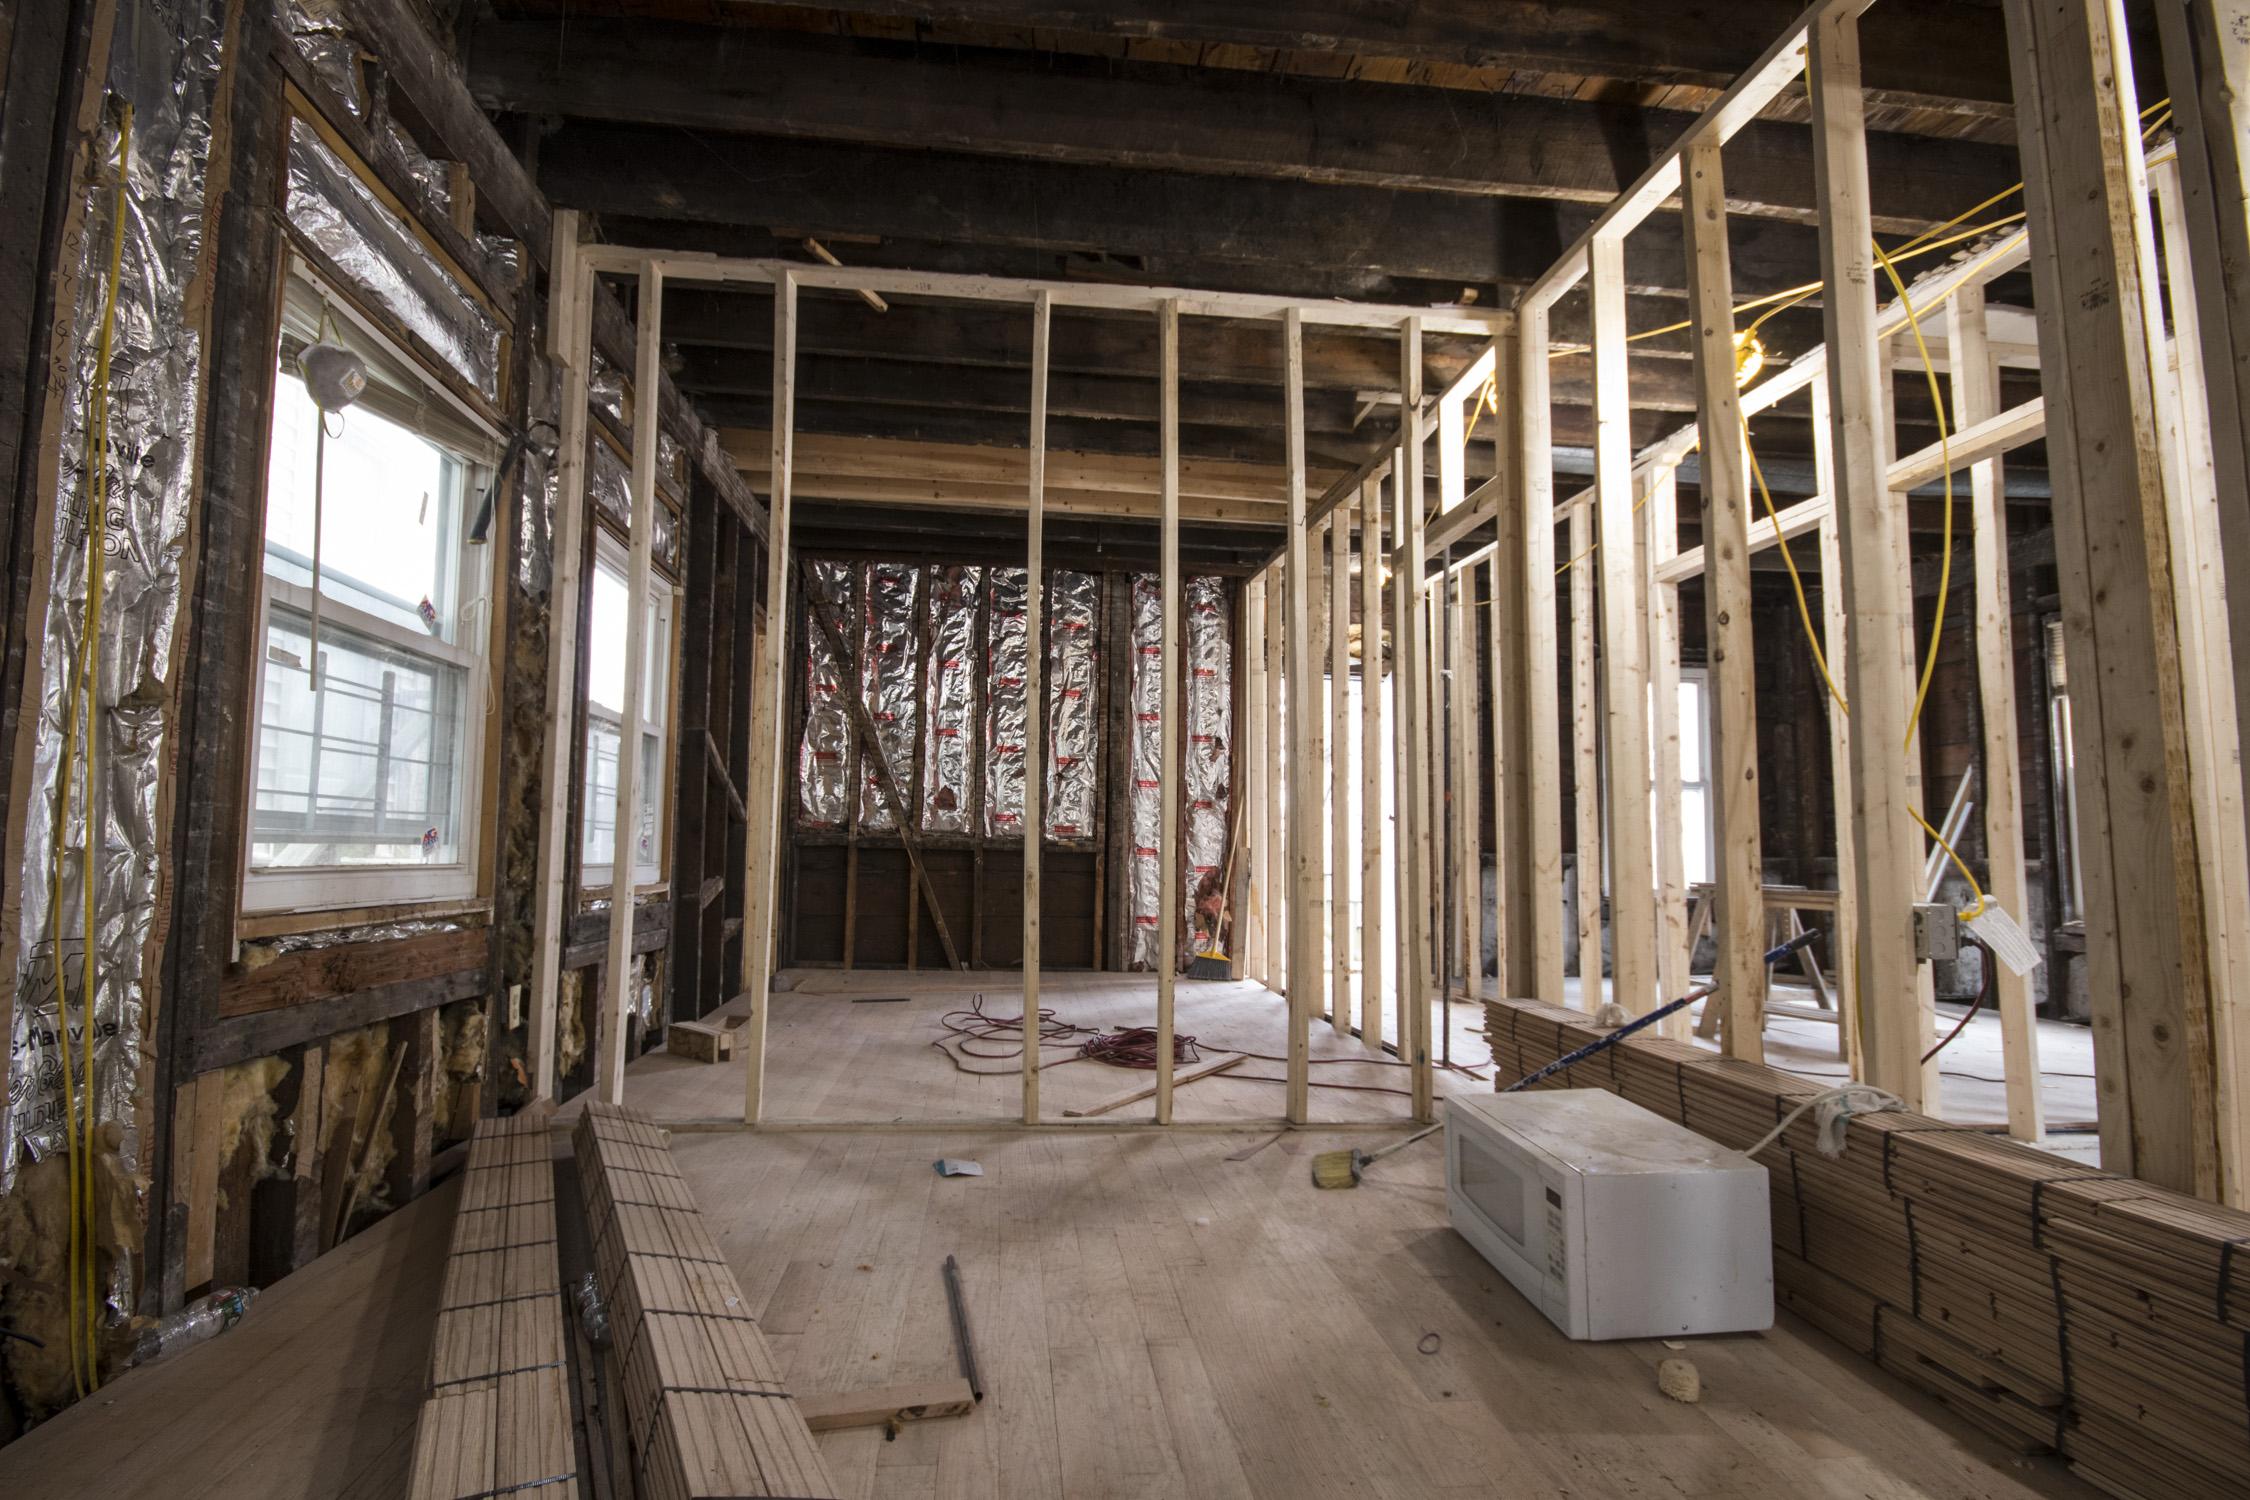 25 darling street homer enovation boston general contractors_29